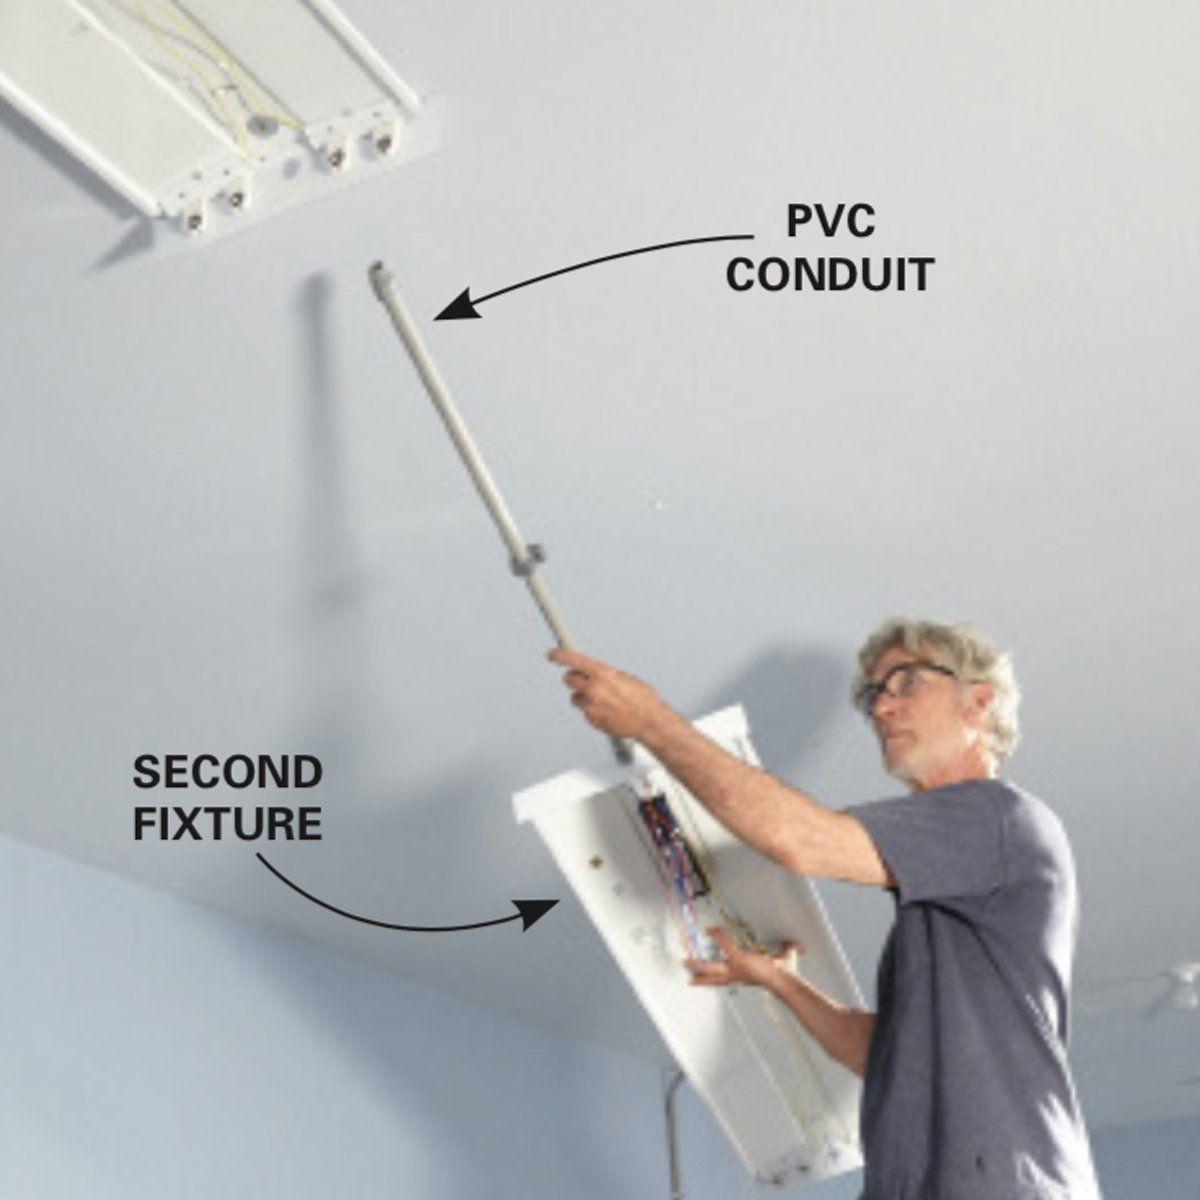 How To Wire A Finished Garage Finished Garage Diy Garage Door Garage Renovation